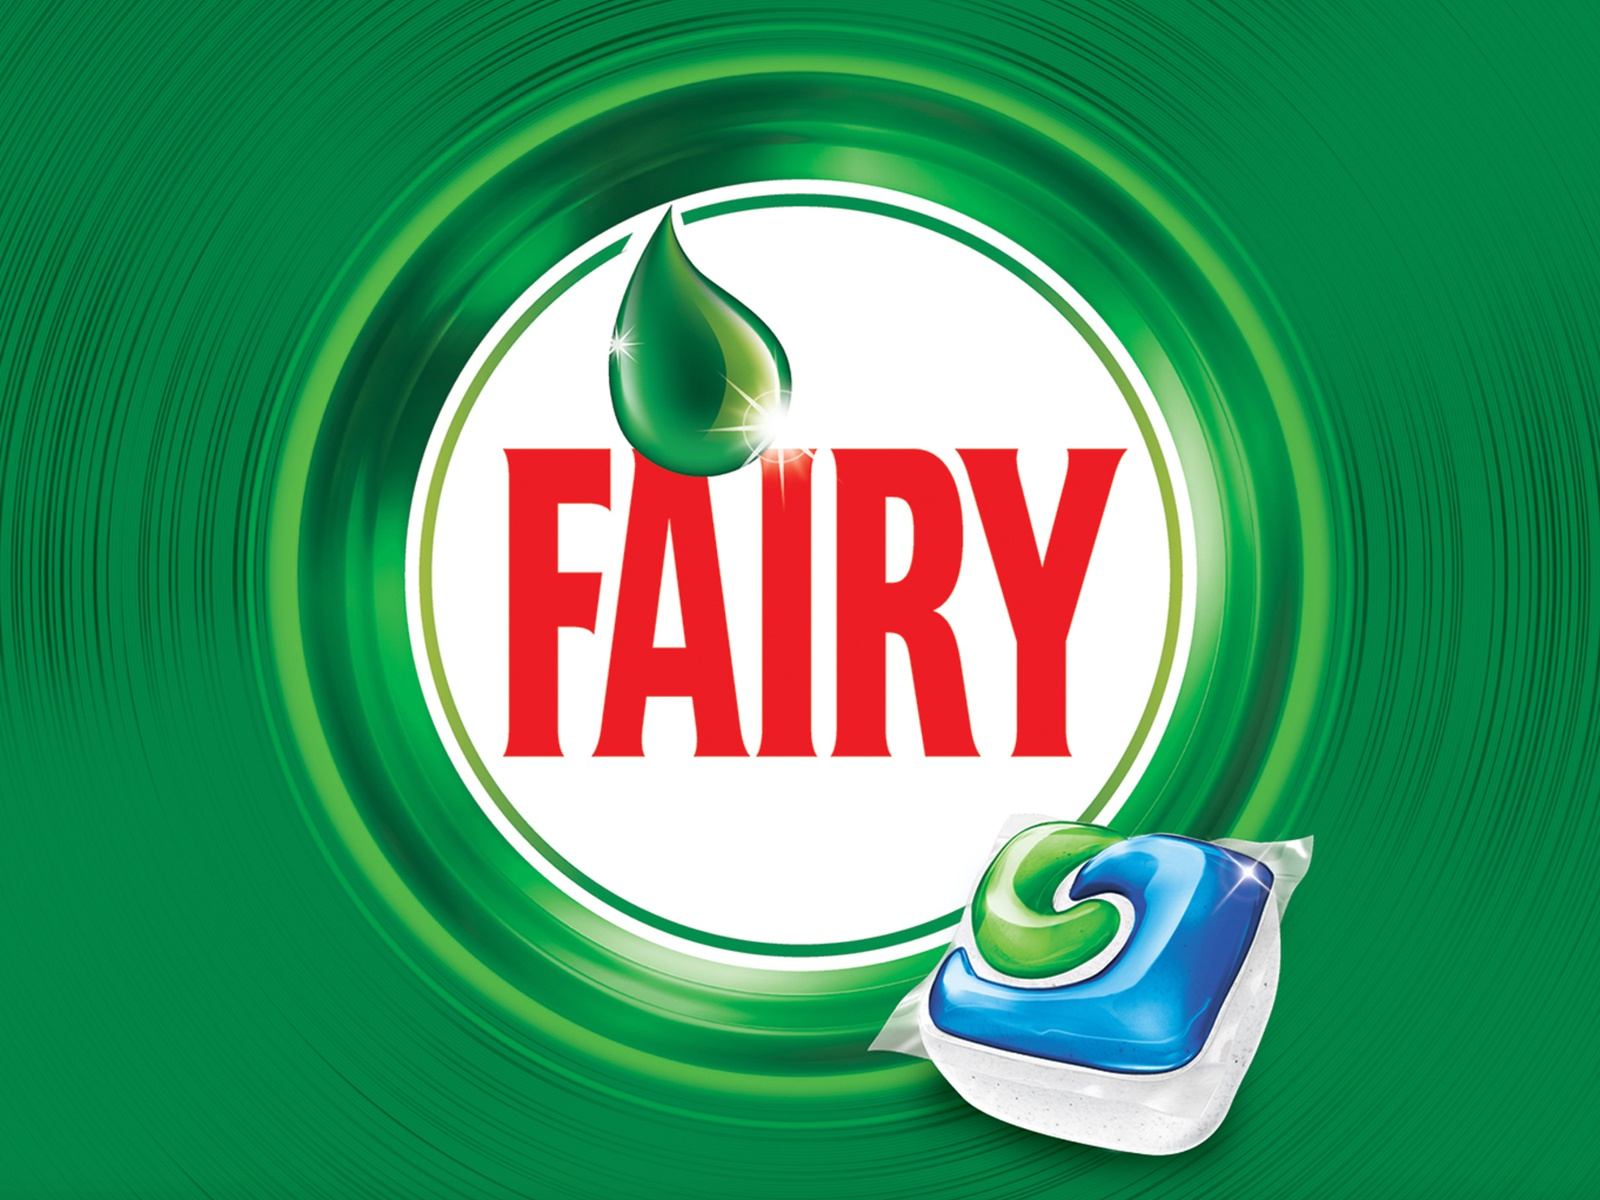 Marques-Logo - Logo-Fairy